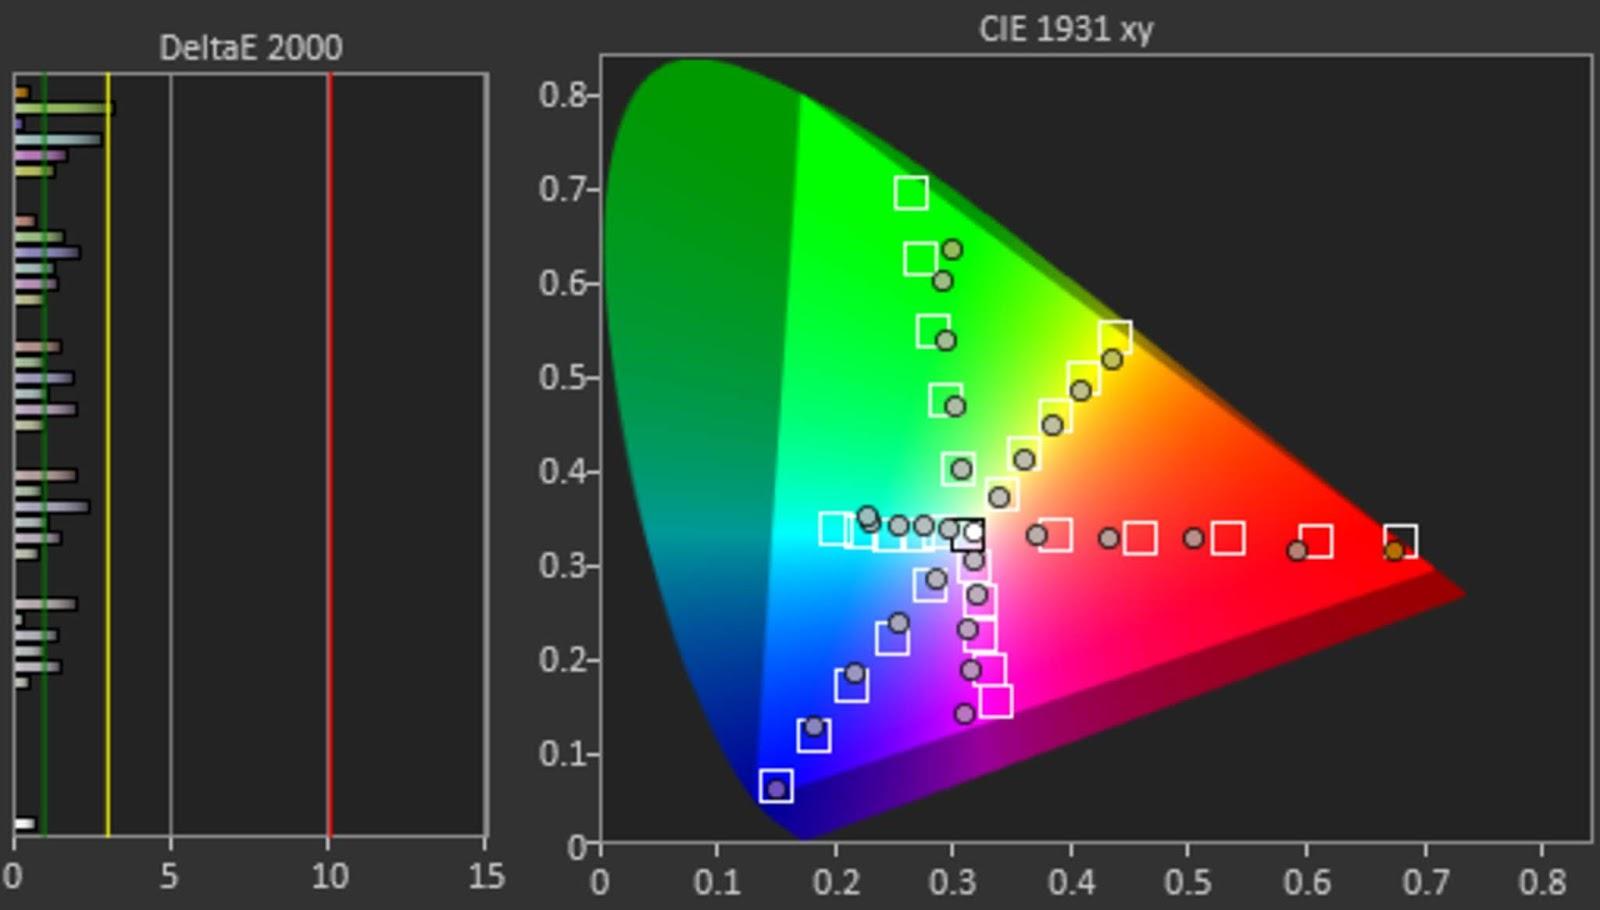 Gama de colores del Samsung Q70T